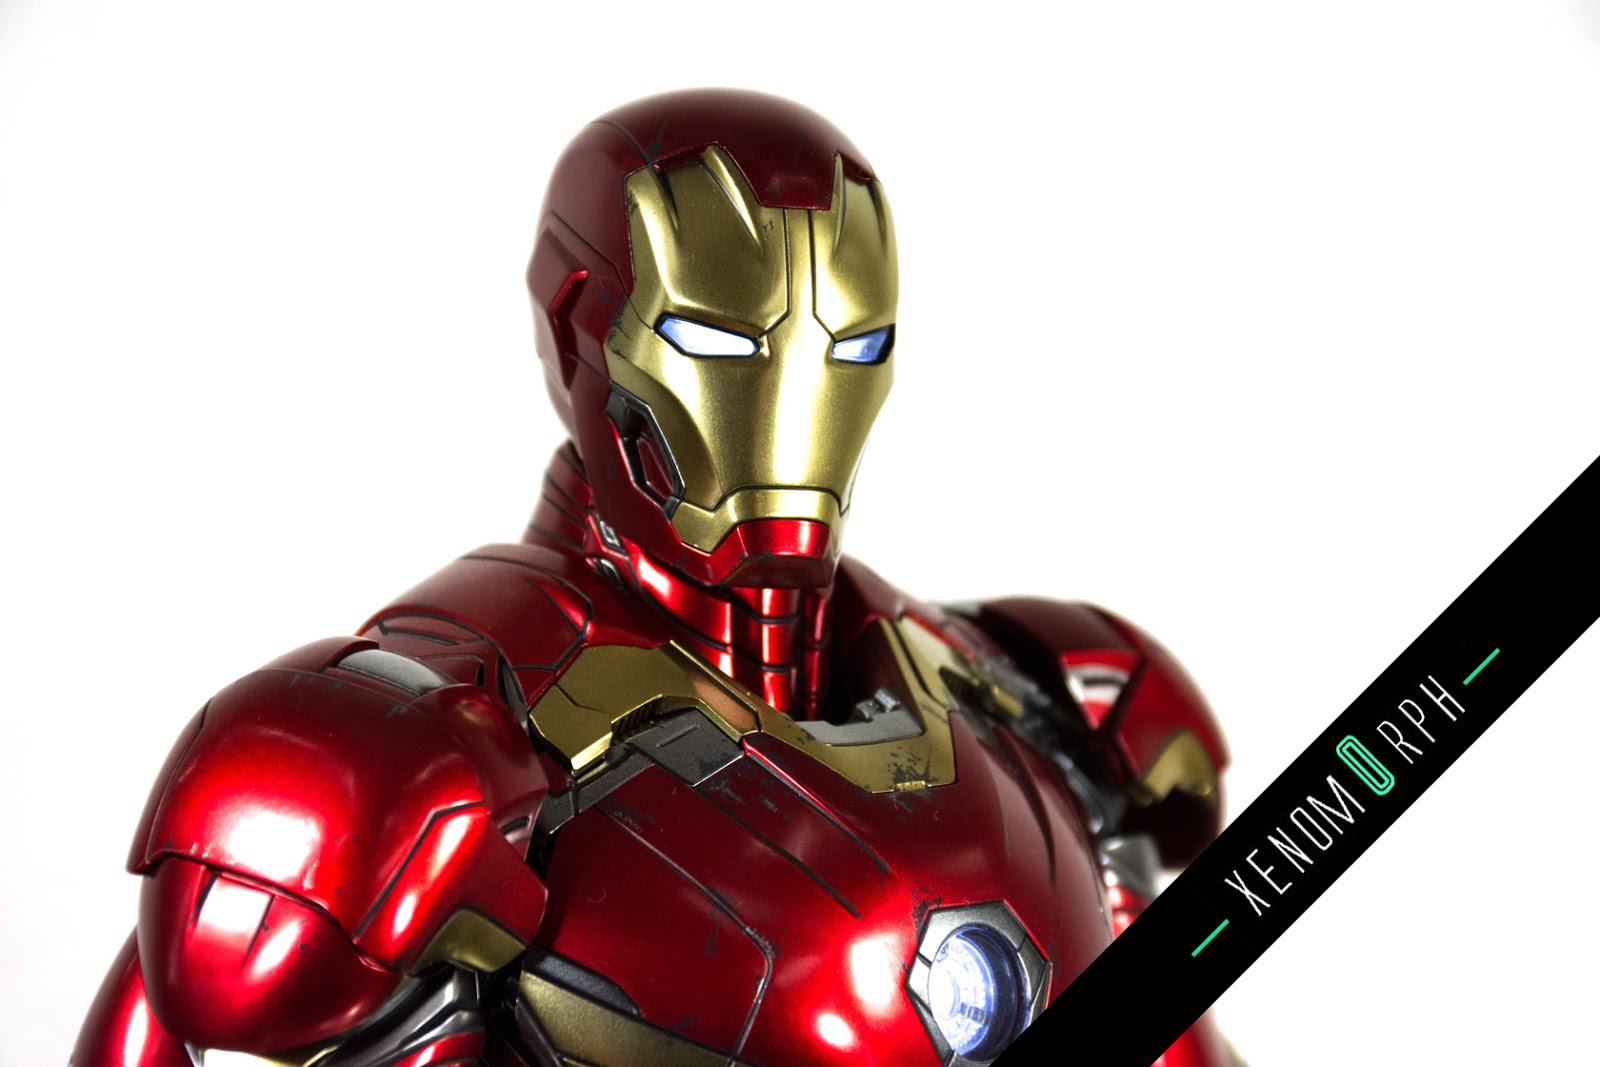 Hot Toys Iron Man Mark 45 XLV - Avengers Age of Ultron - 1 ...